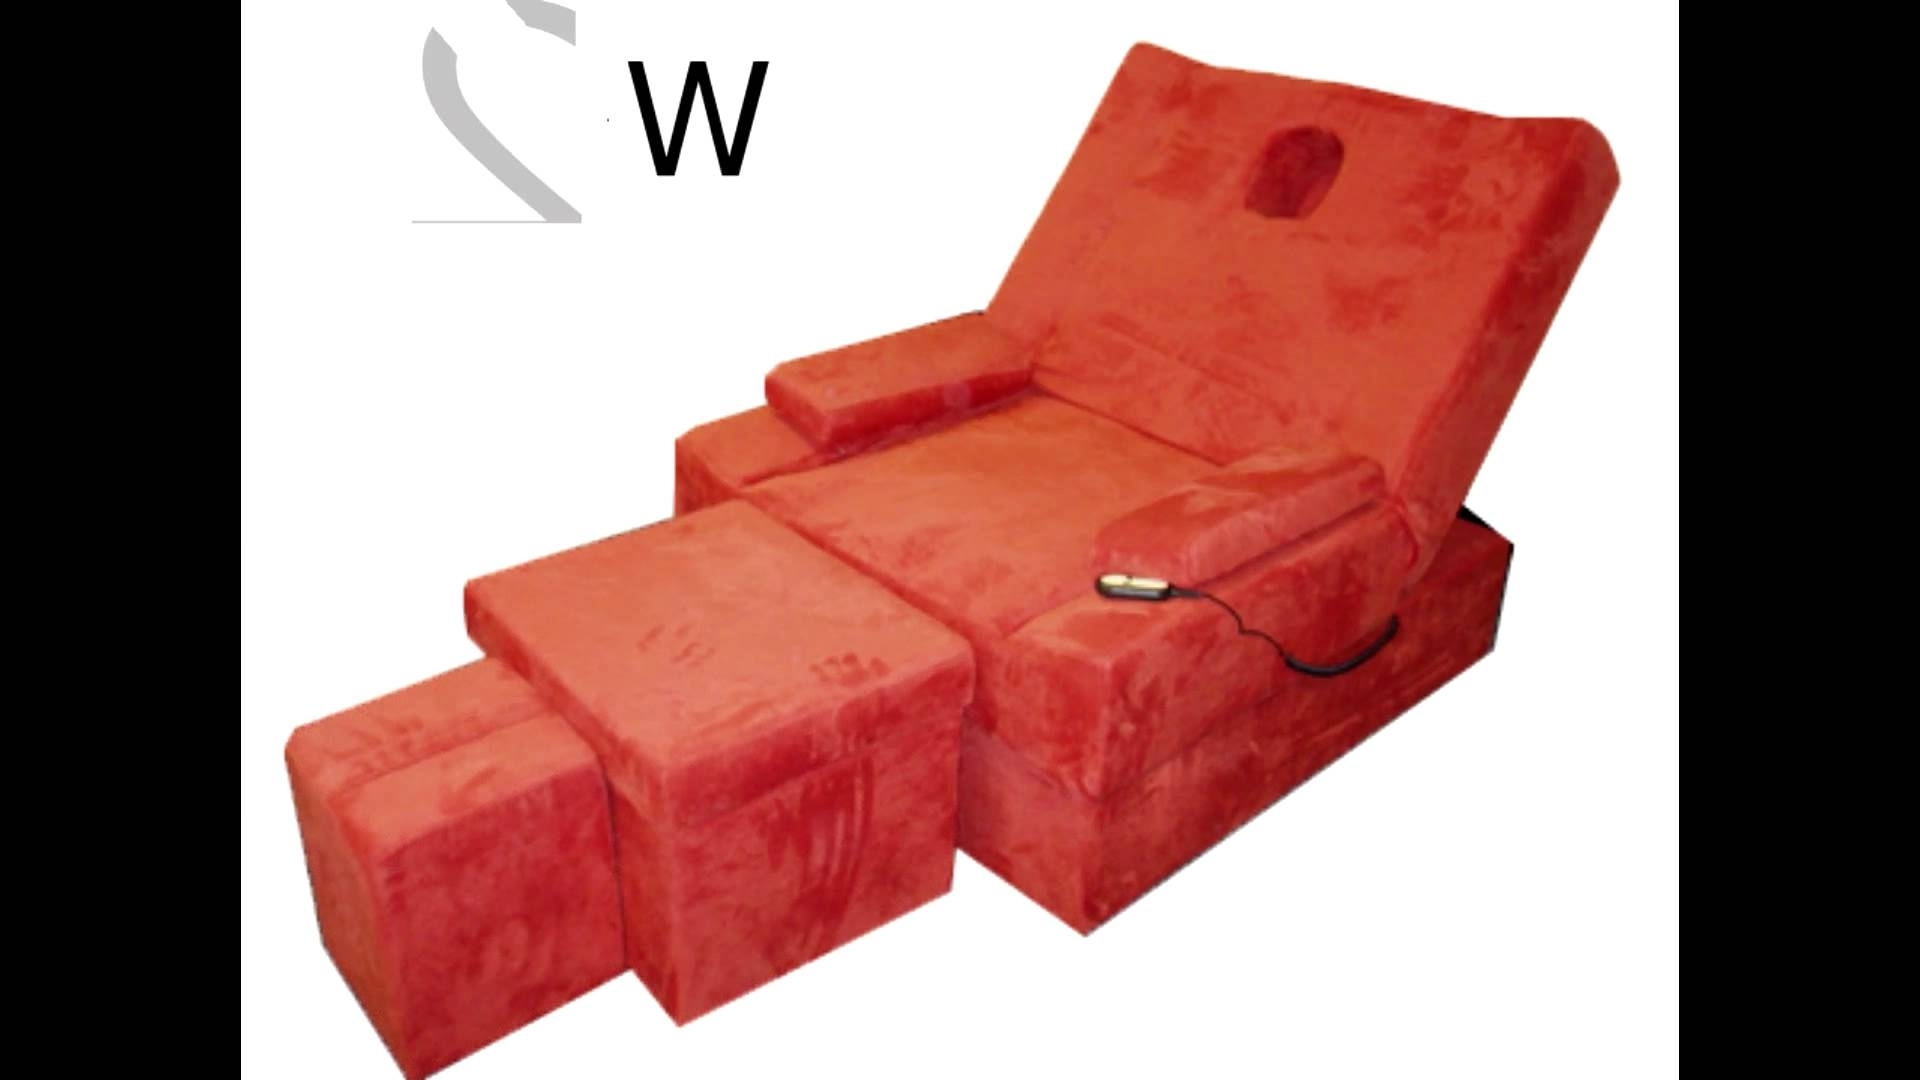 2017 Electric Foot Massage Sofa Set 电动足浴沙发  Youtube Regarding Foot Massage Sofas (View 1 of 15)